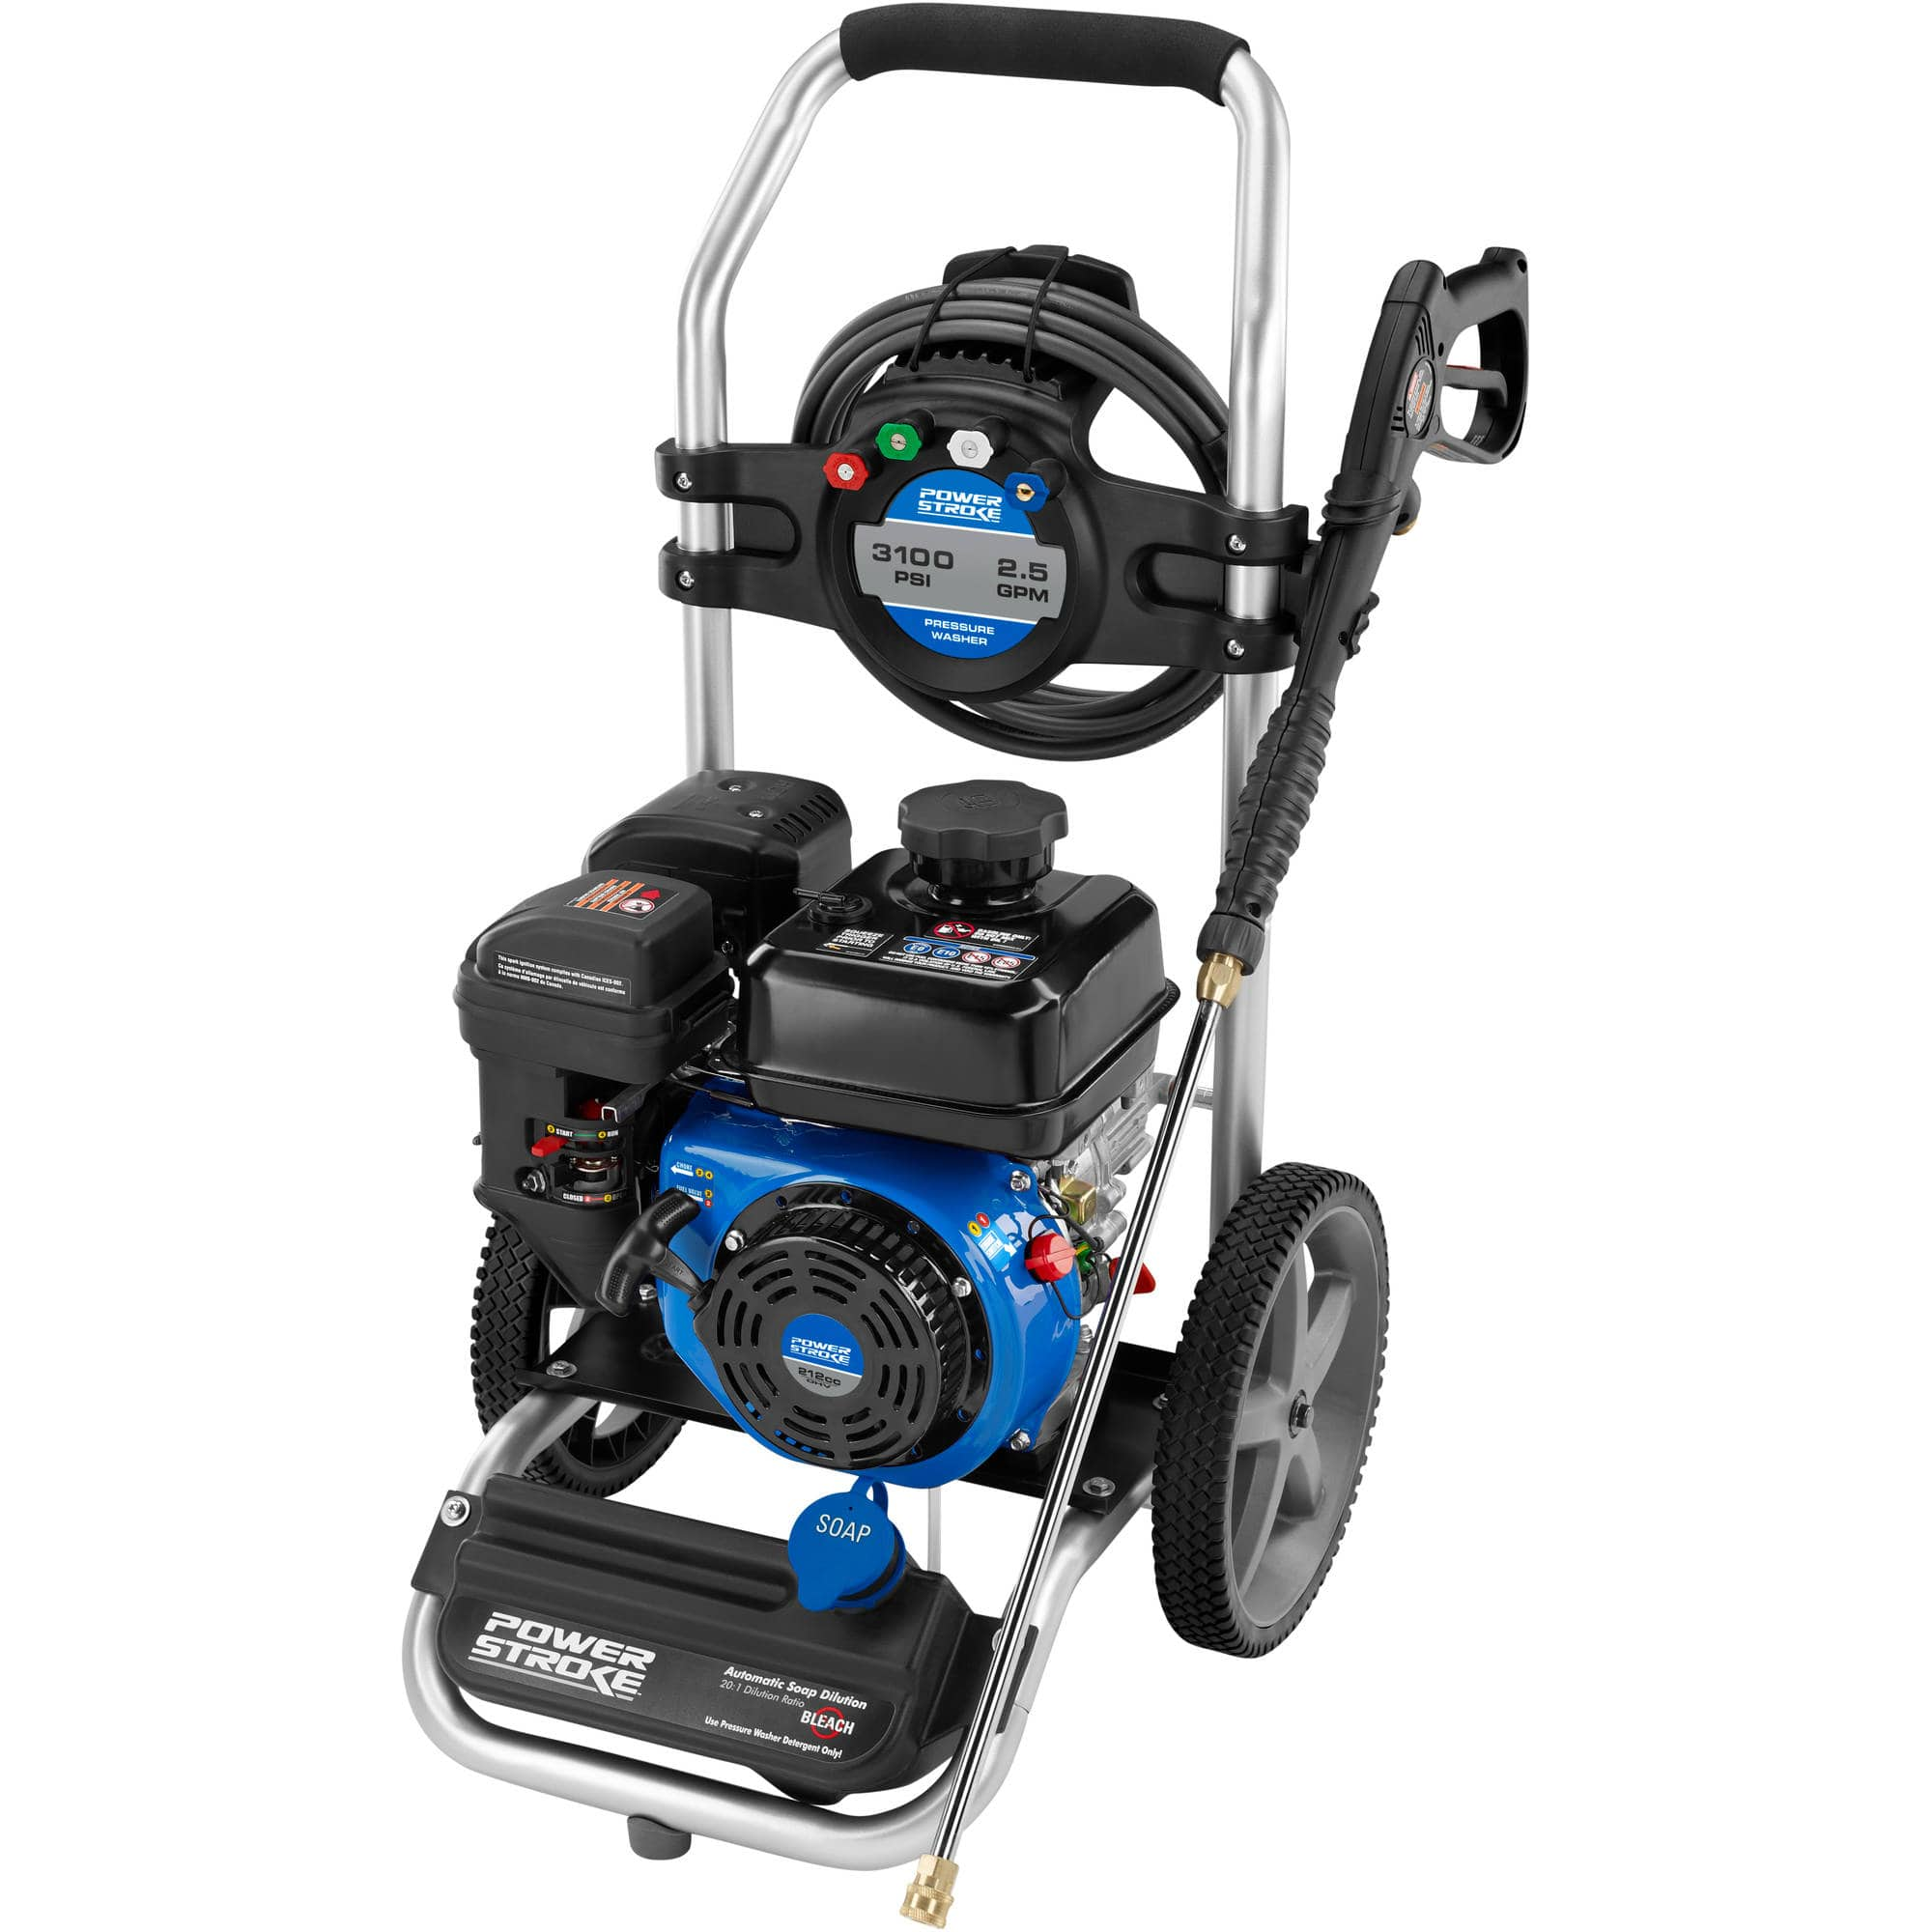 PowerStroke 3100 PSI Gas Pressure Washer Walmart $249 B&M YMMV